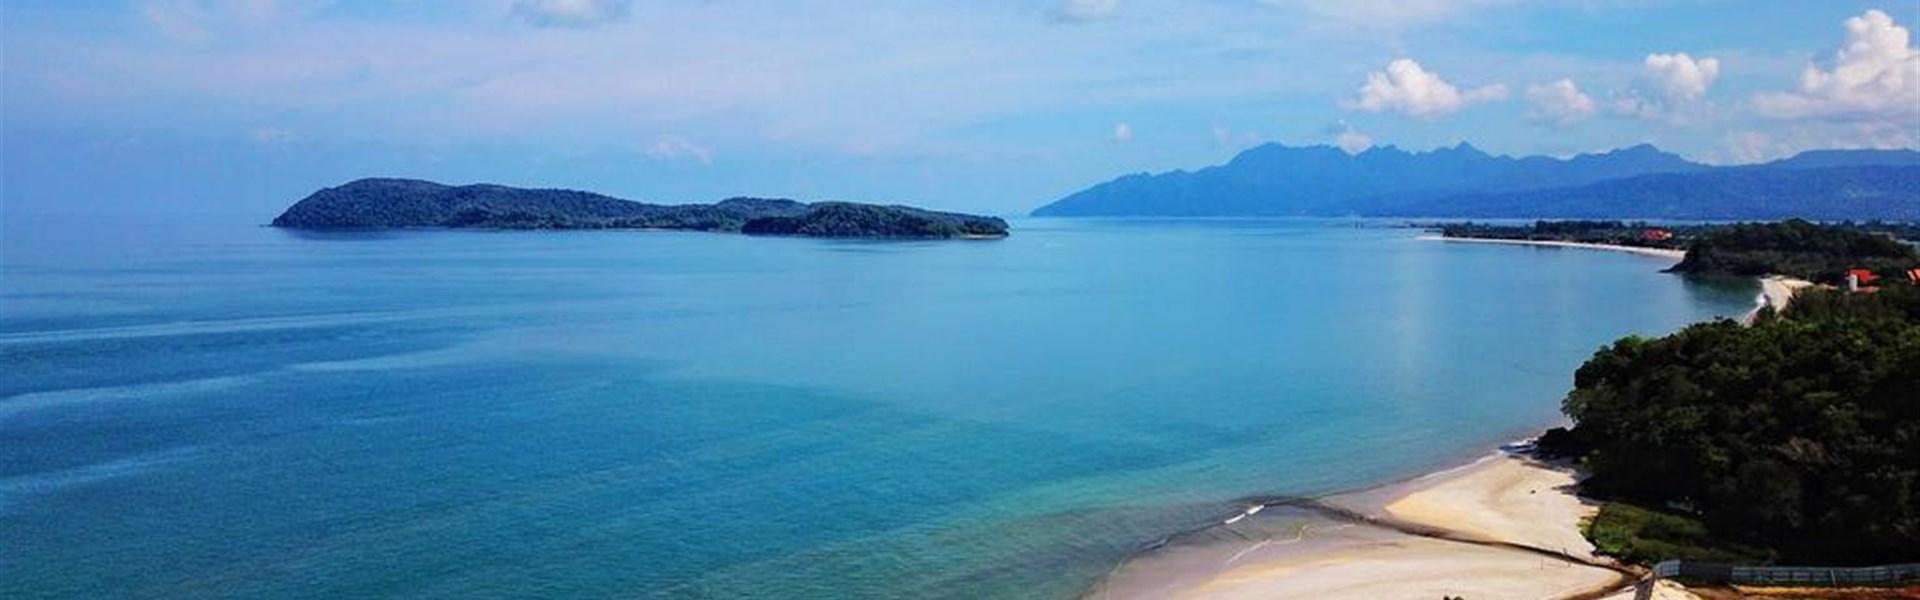 Marco Polo - Holiday Villa Beach Resort and Spa -